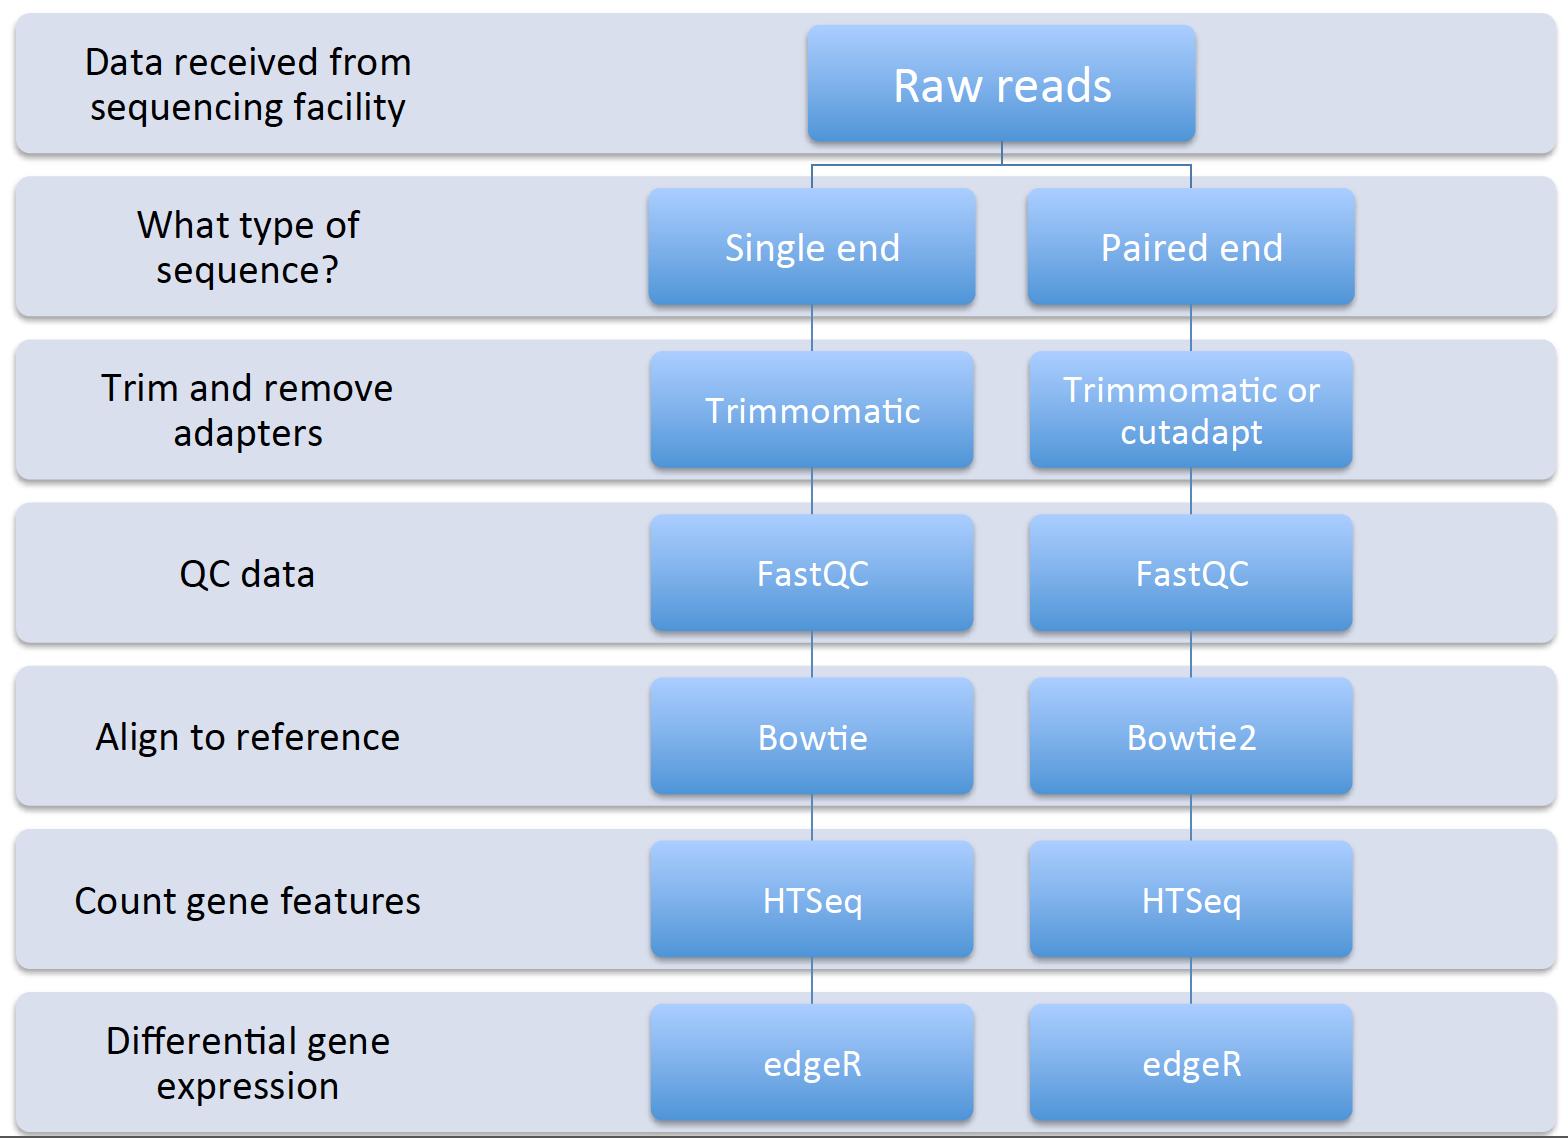 RNA-seq background information, data analysis procedure, and